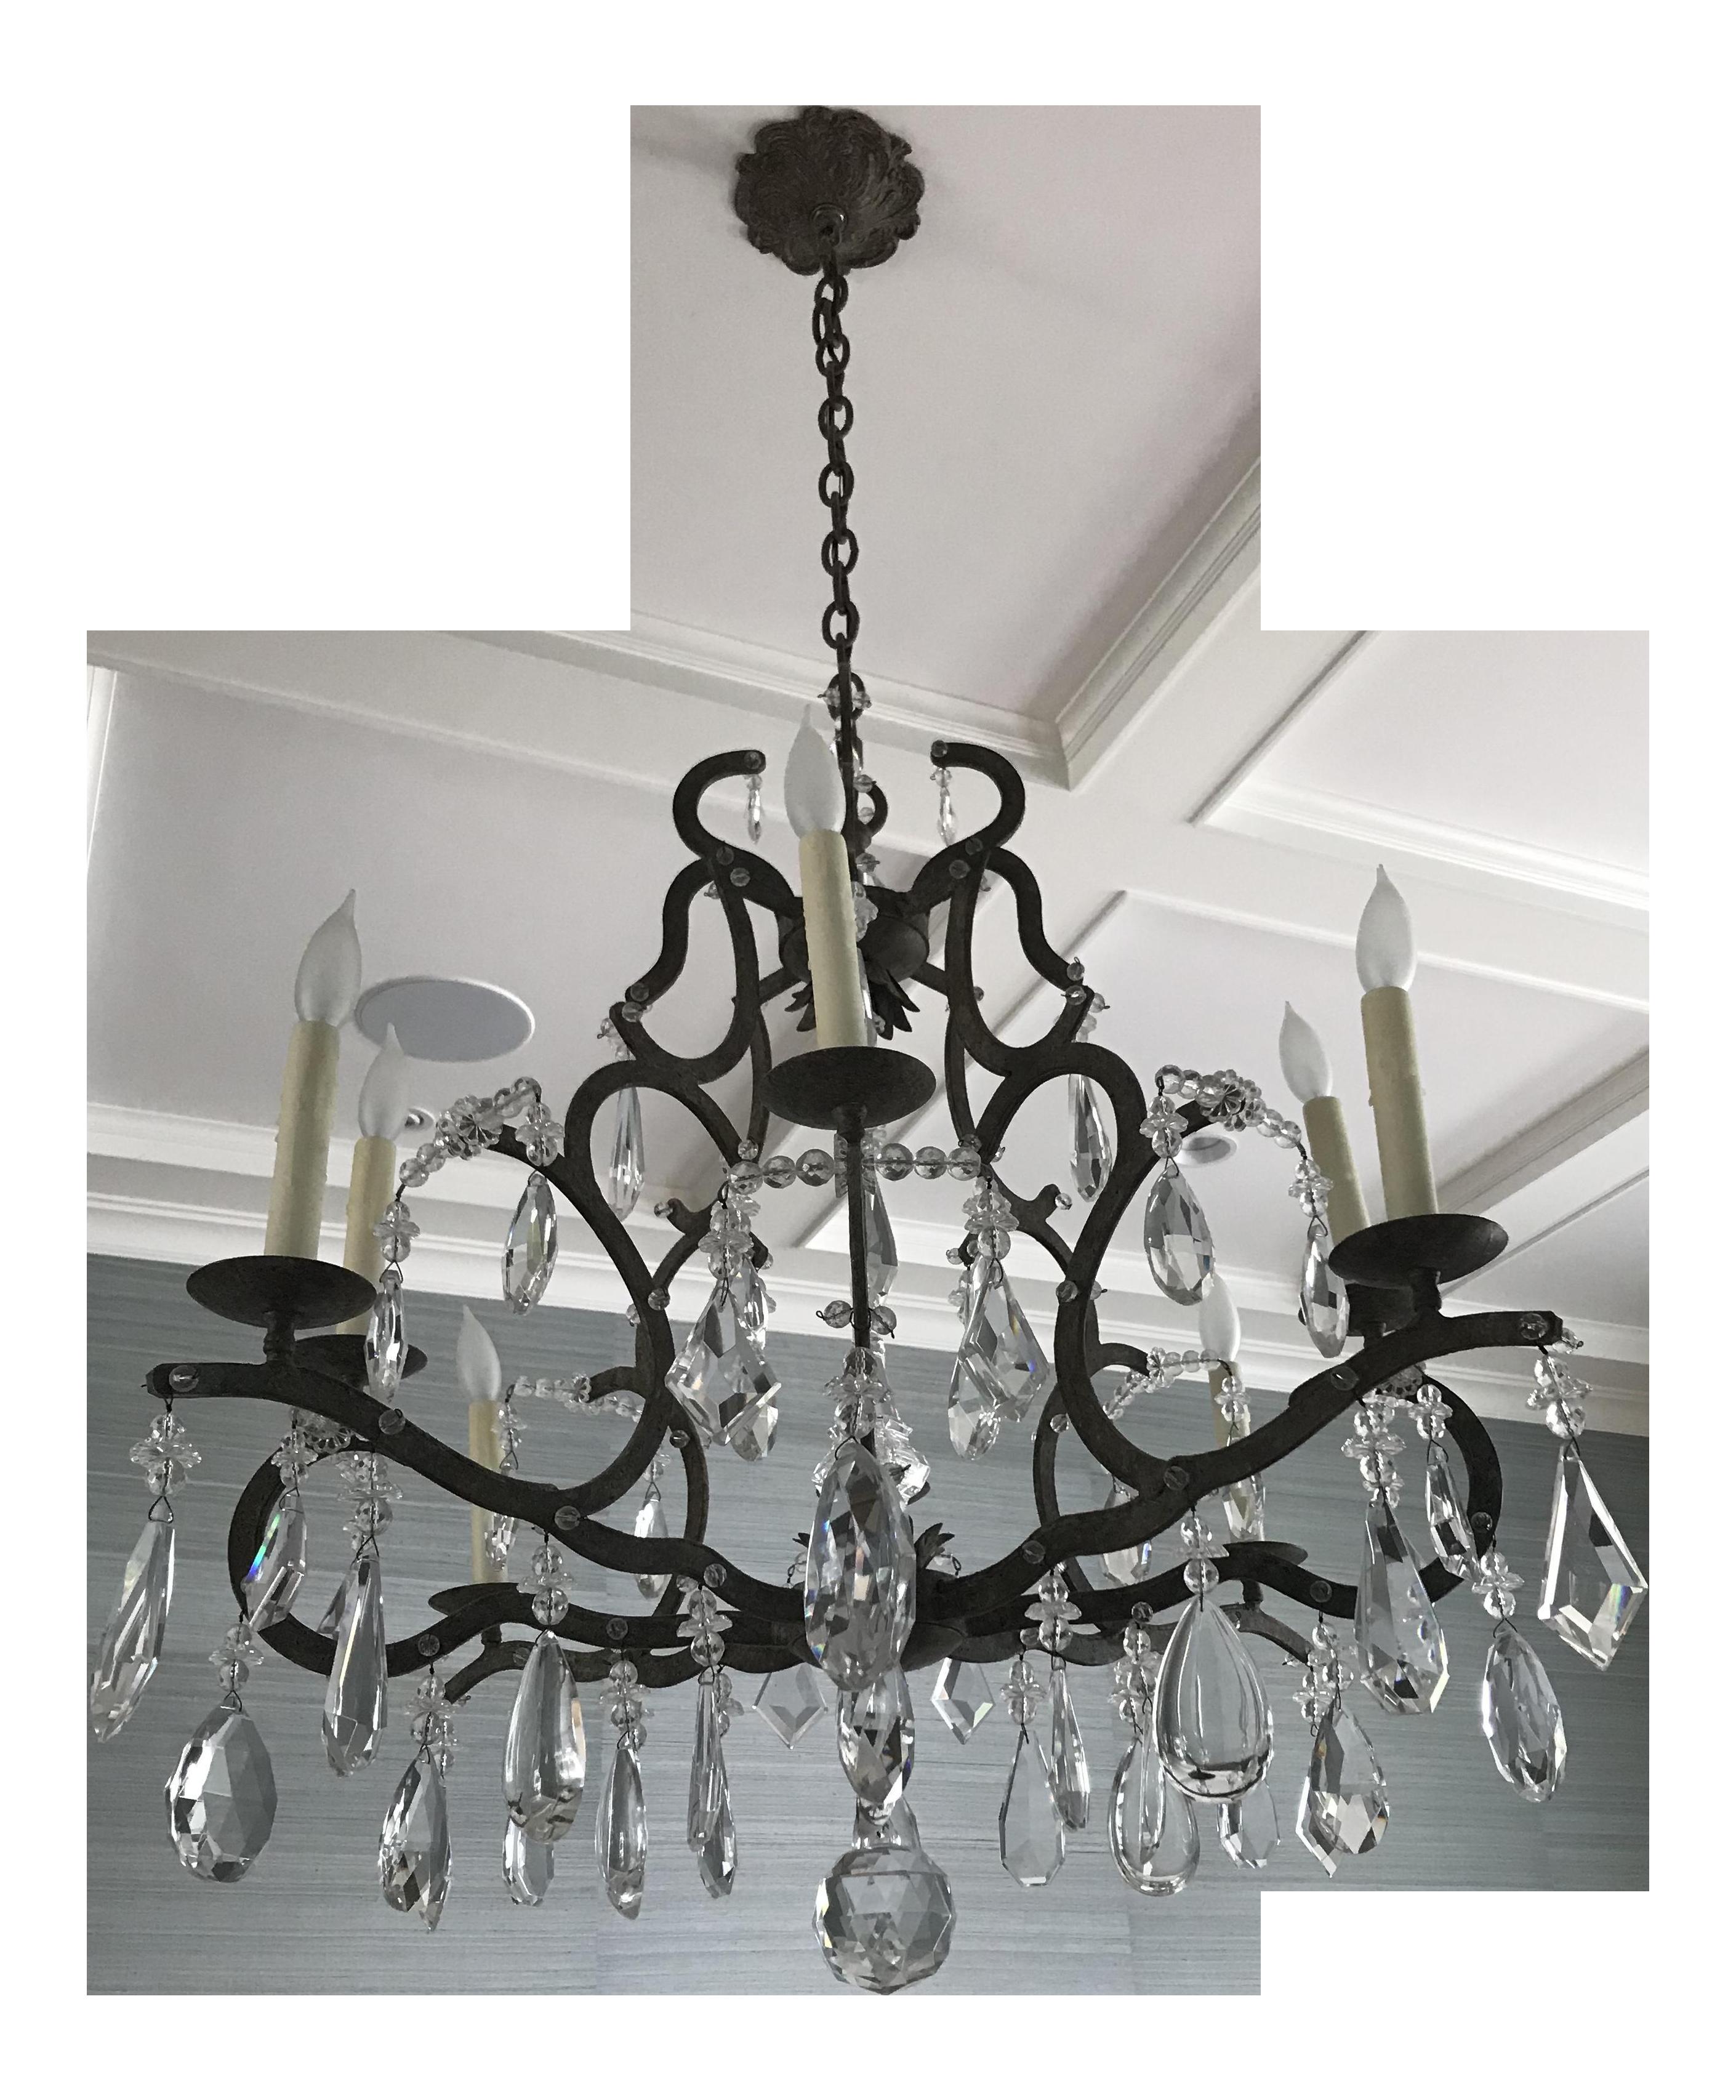 metropolitan victorian pin lovely art gaslight chandelier of museum